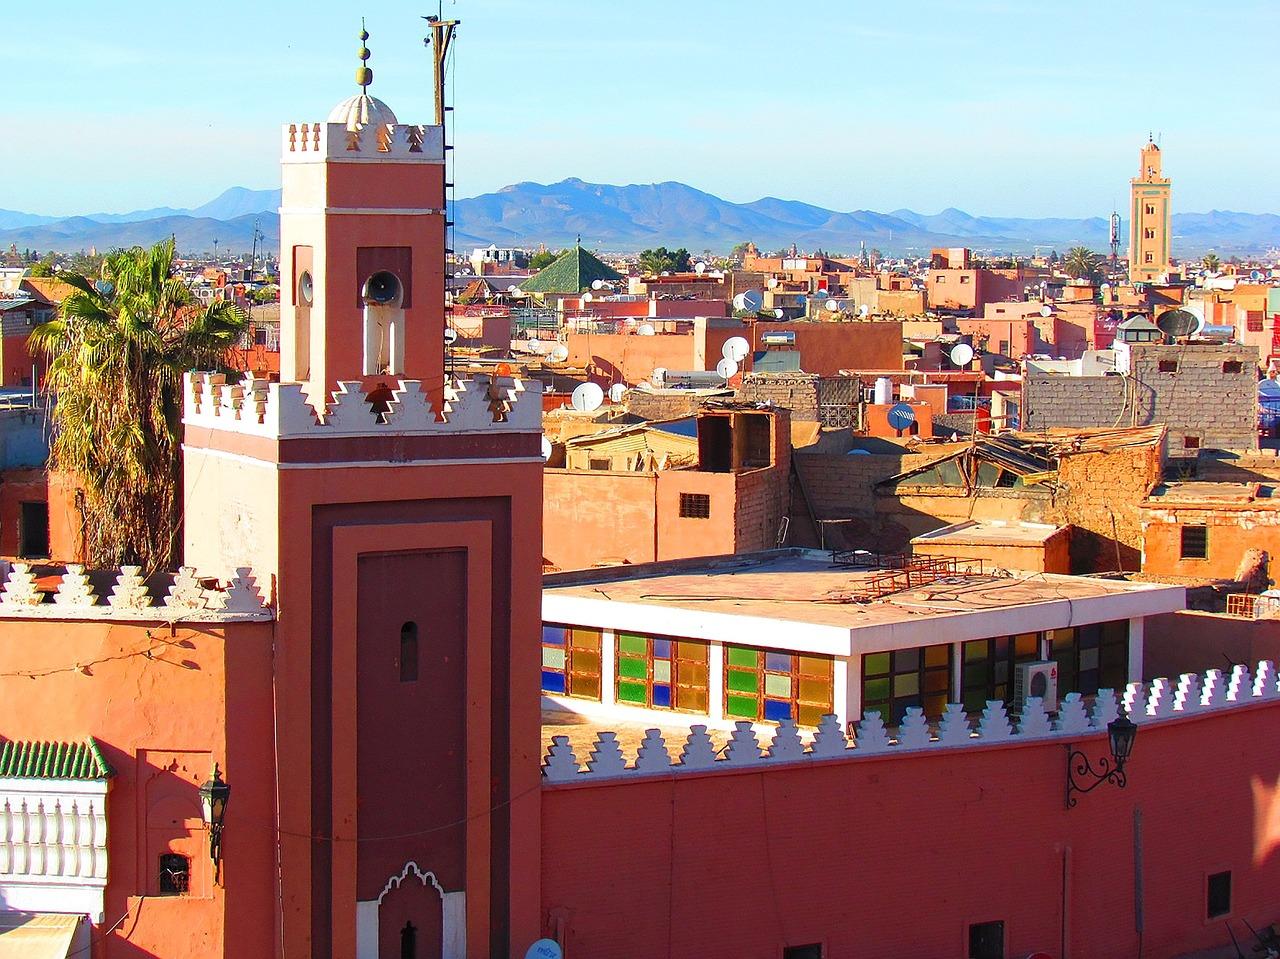 Rundreise Königsstädte Marokko - Marrakesch 1